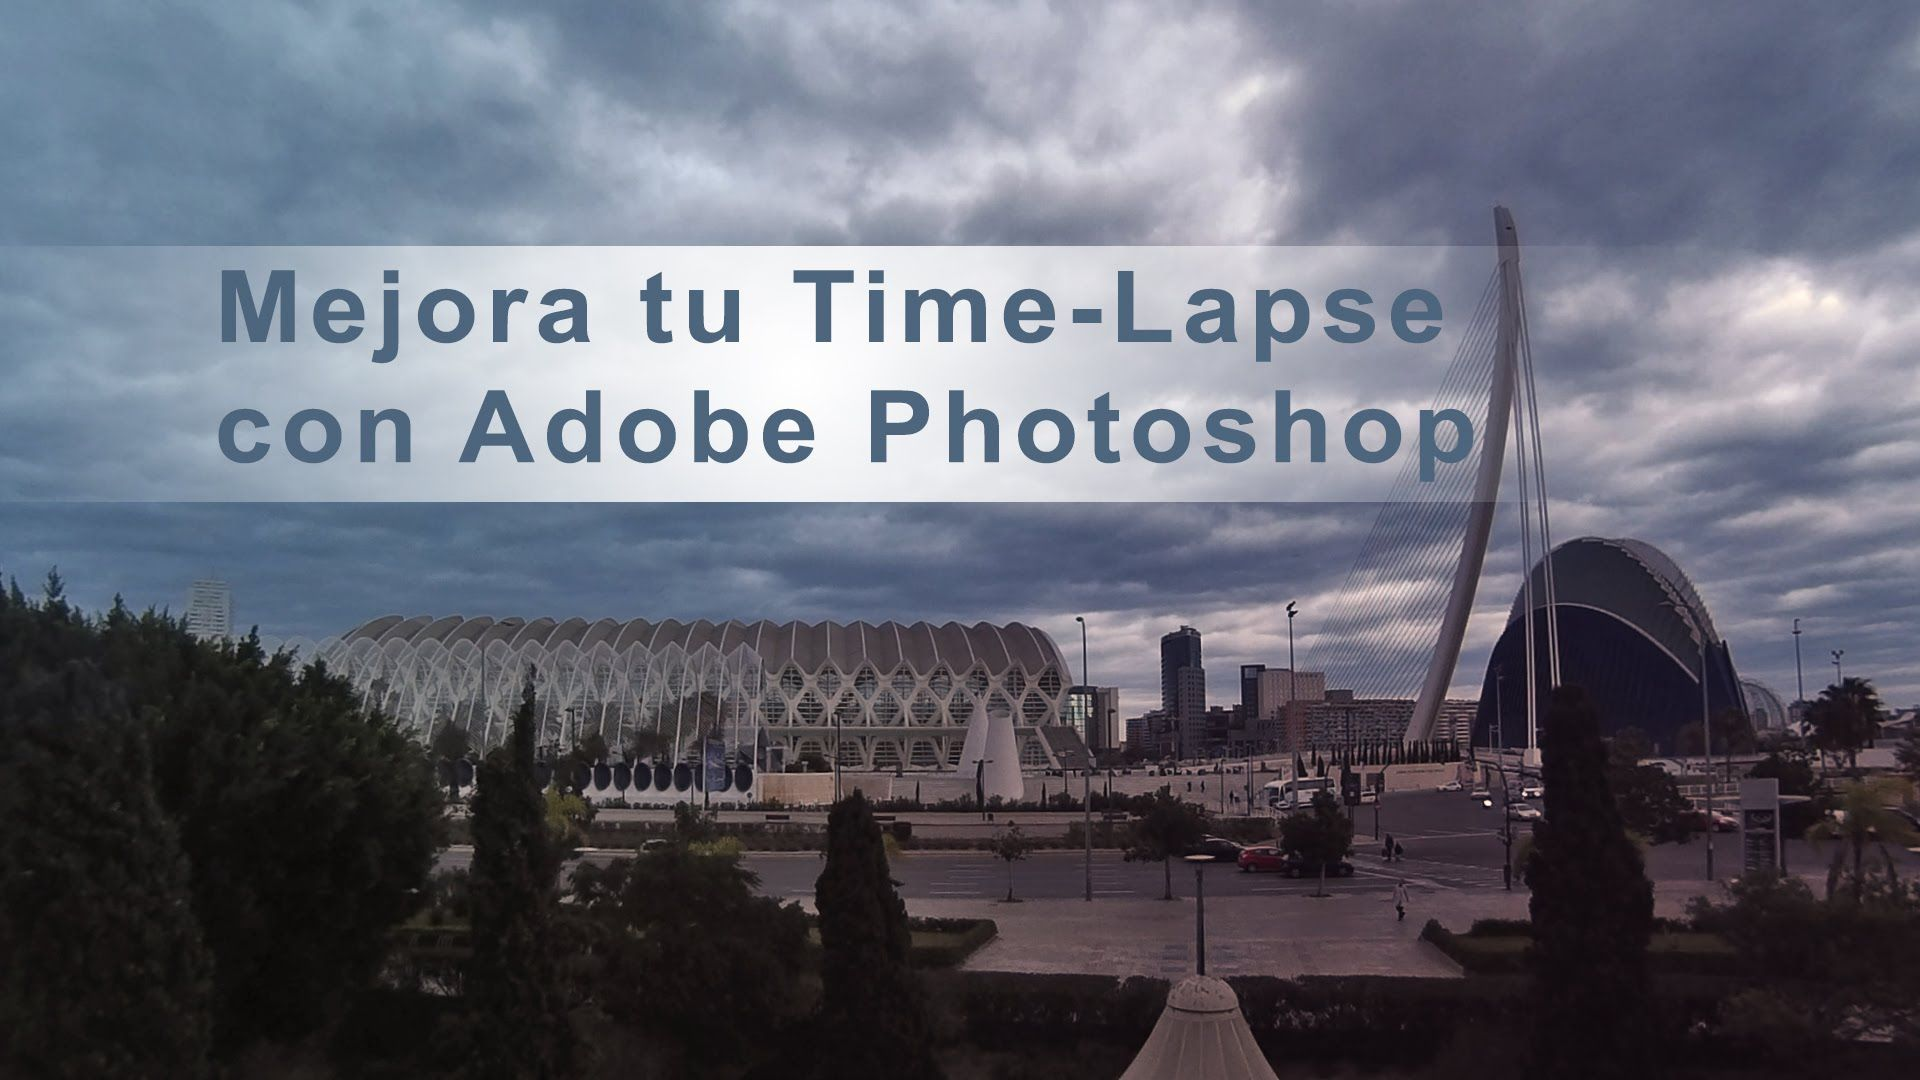 #youtube #youtuber #timelapse #time_lapse #city #urban #CAC #Valencia #Spain #tutoriao #videotutorial #video #mejorar_time_lapse #mejora_time_lapse #photoshop #acciones_de_photoshop #photomamp #photomamp.com